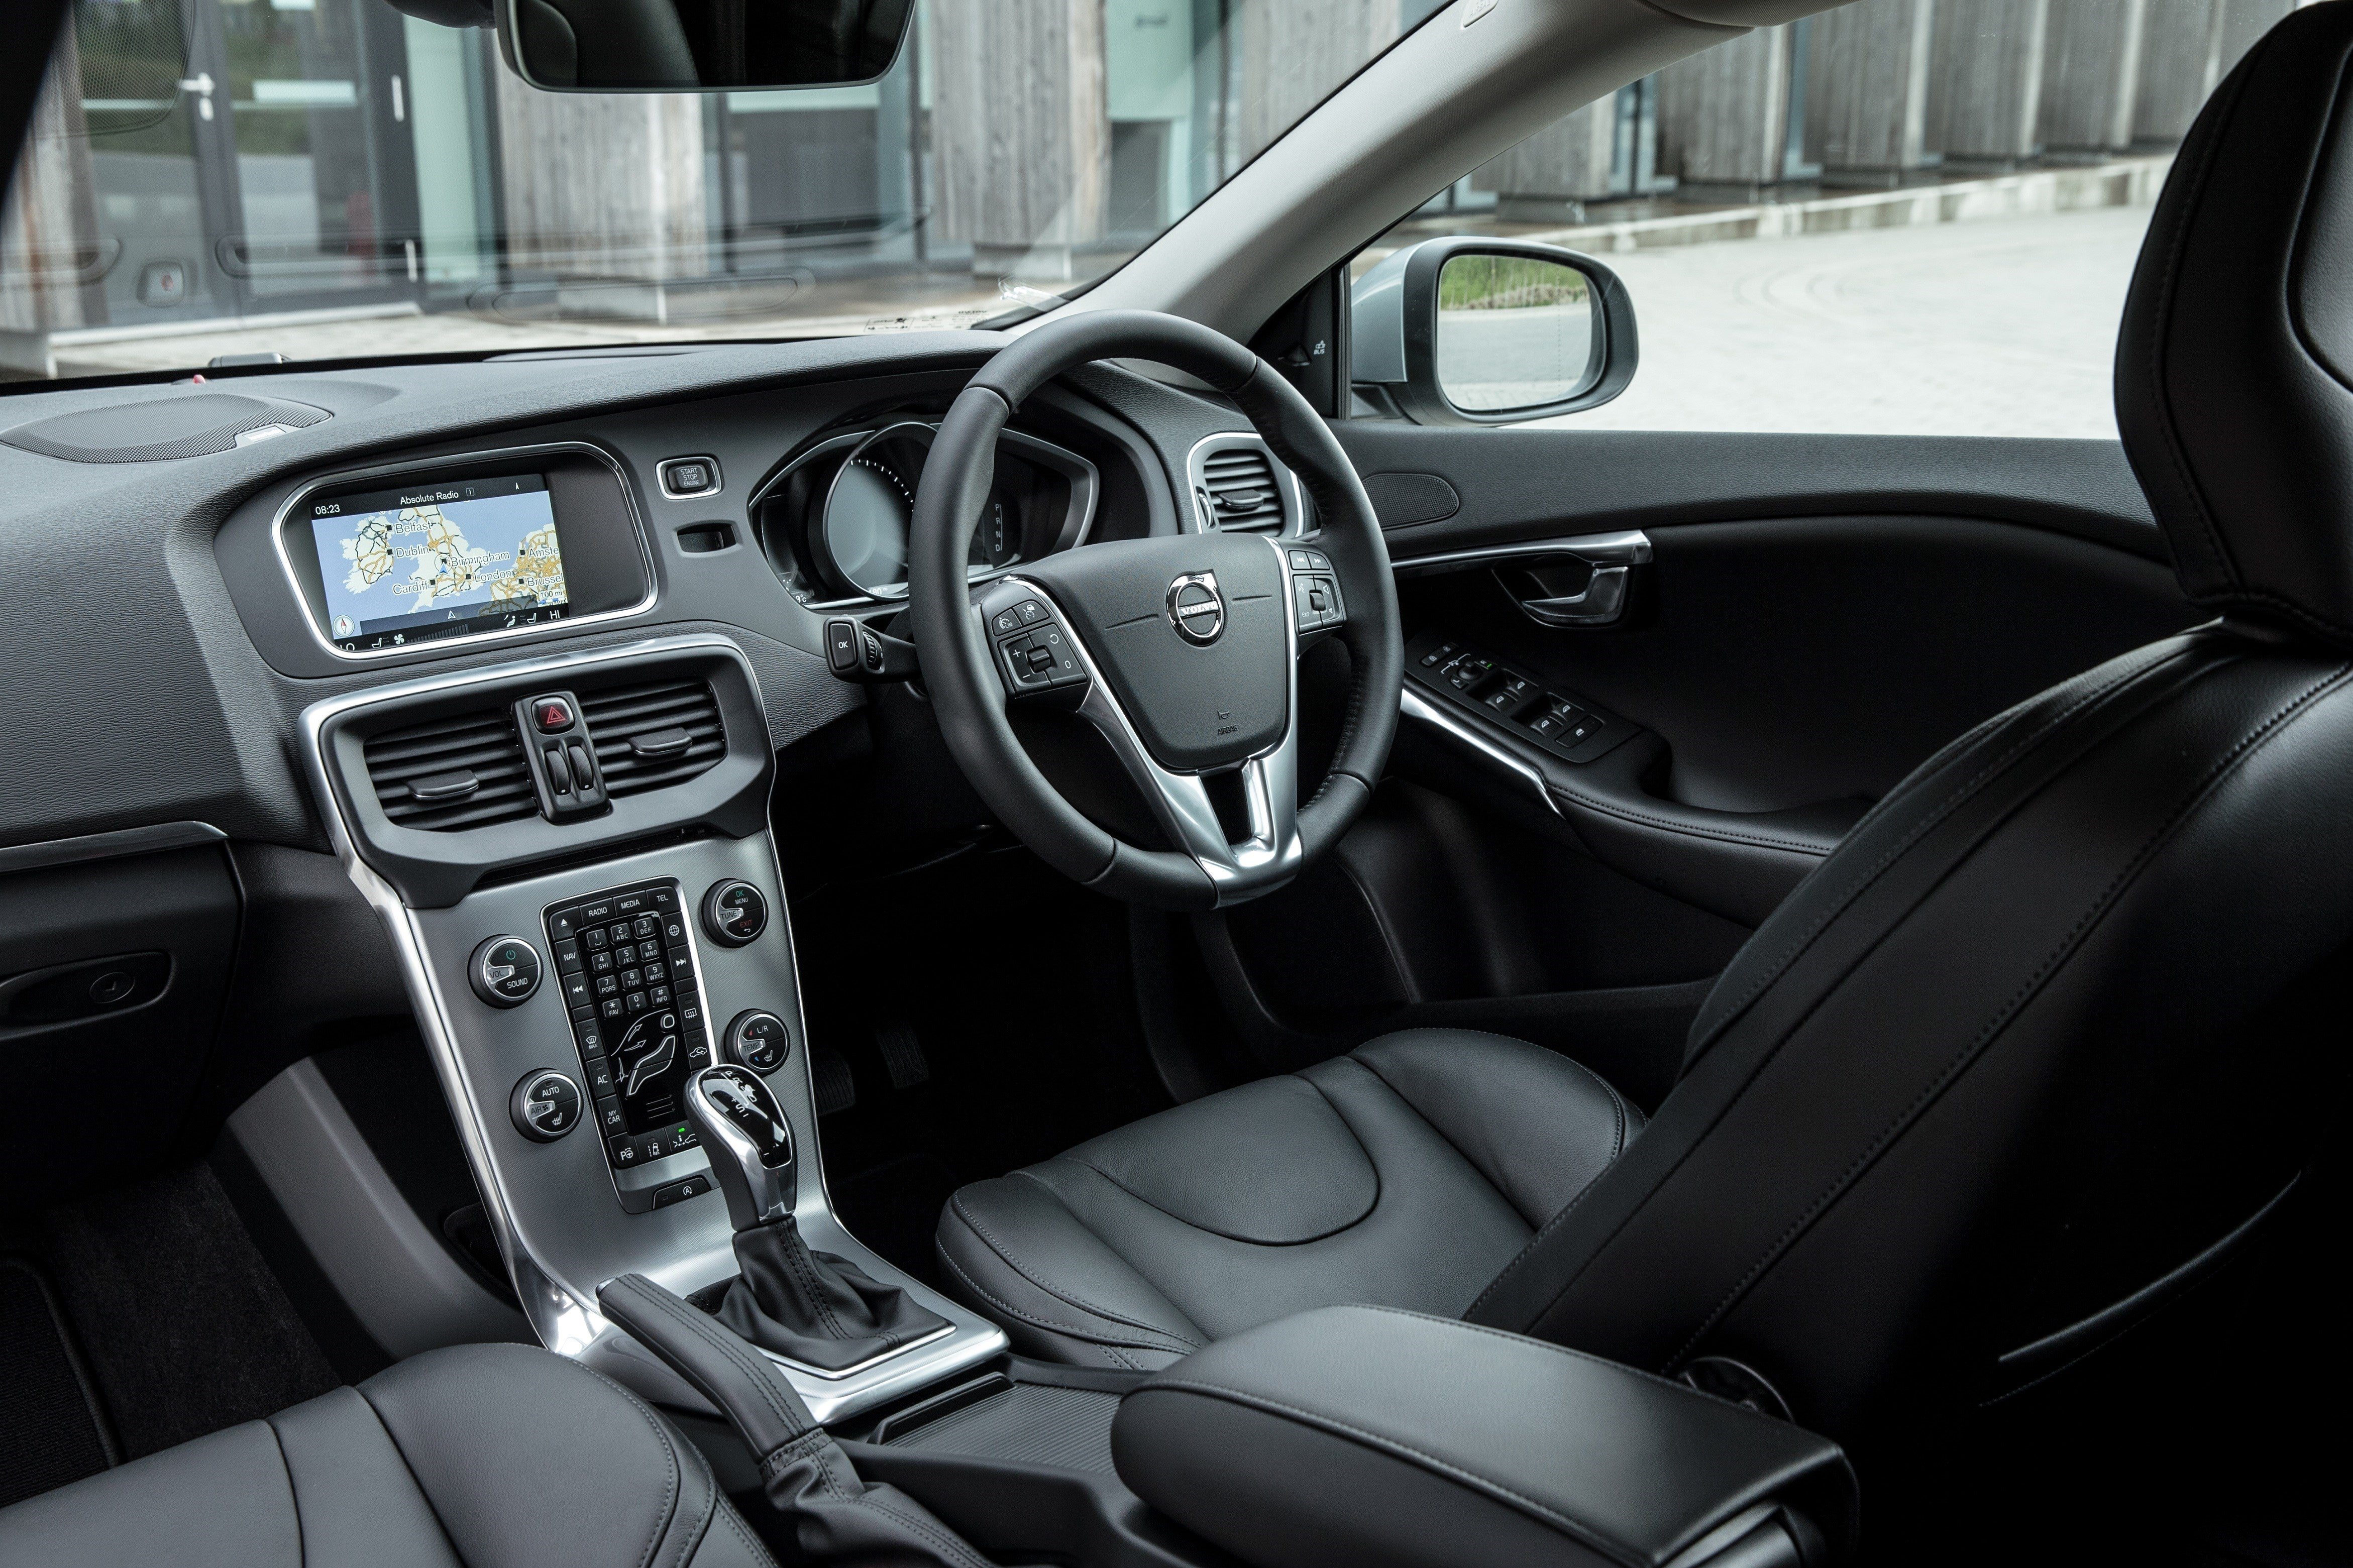 Volvo V40 Front Interior